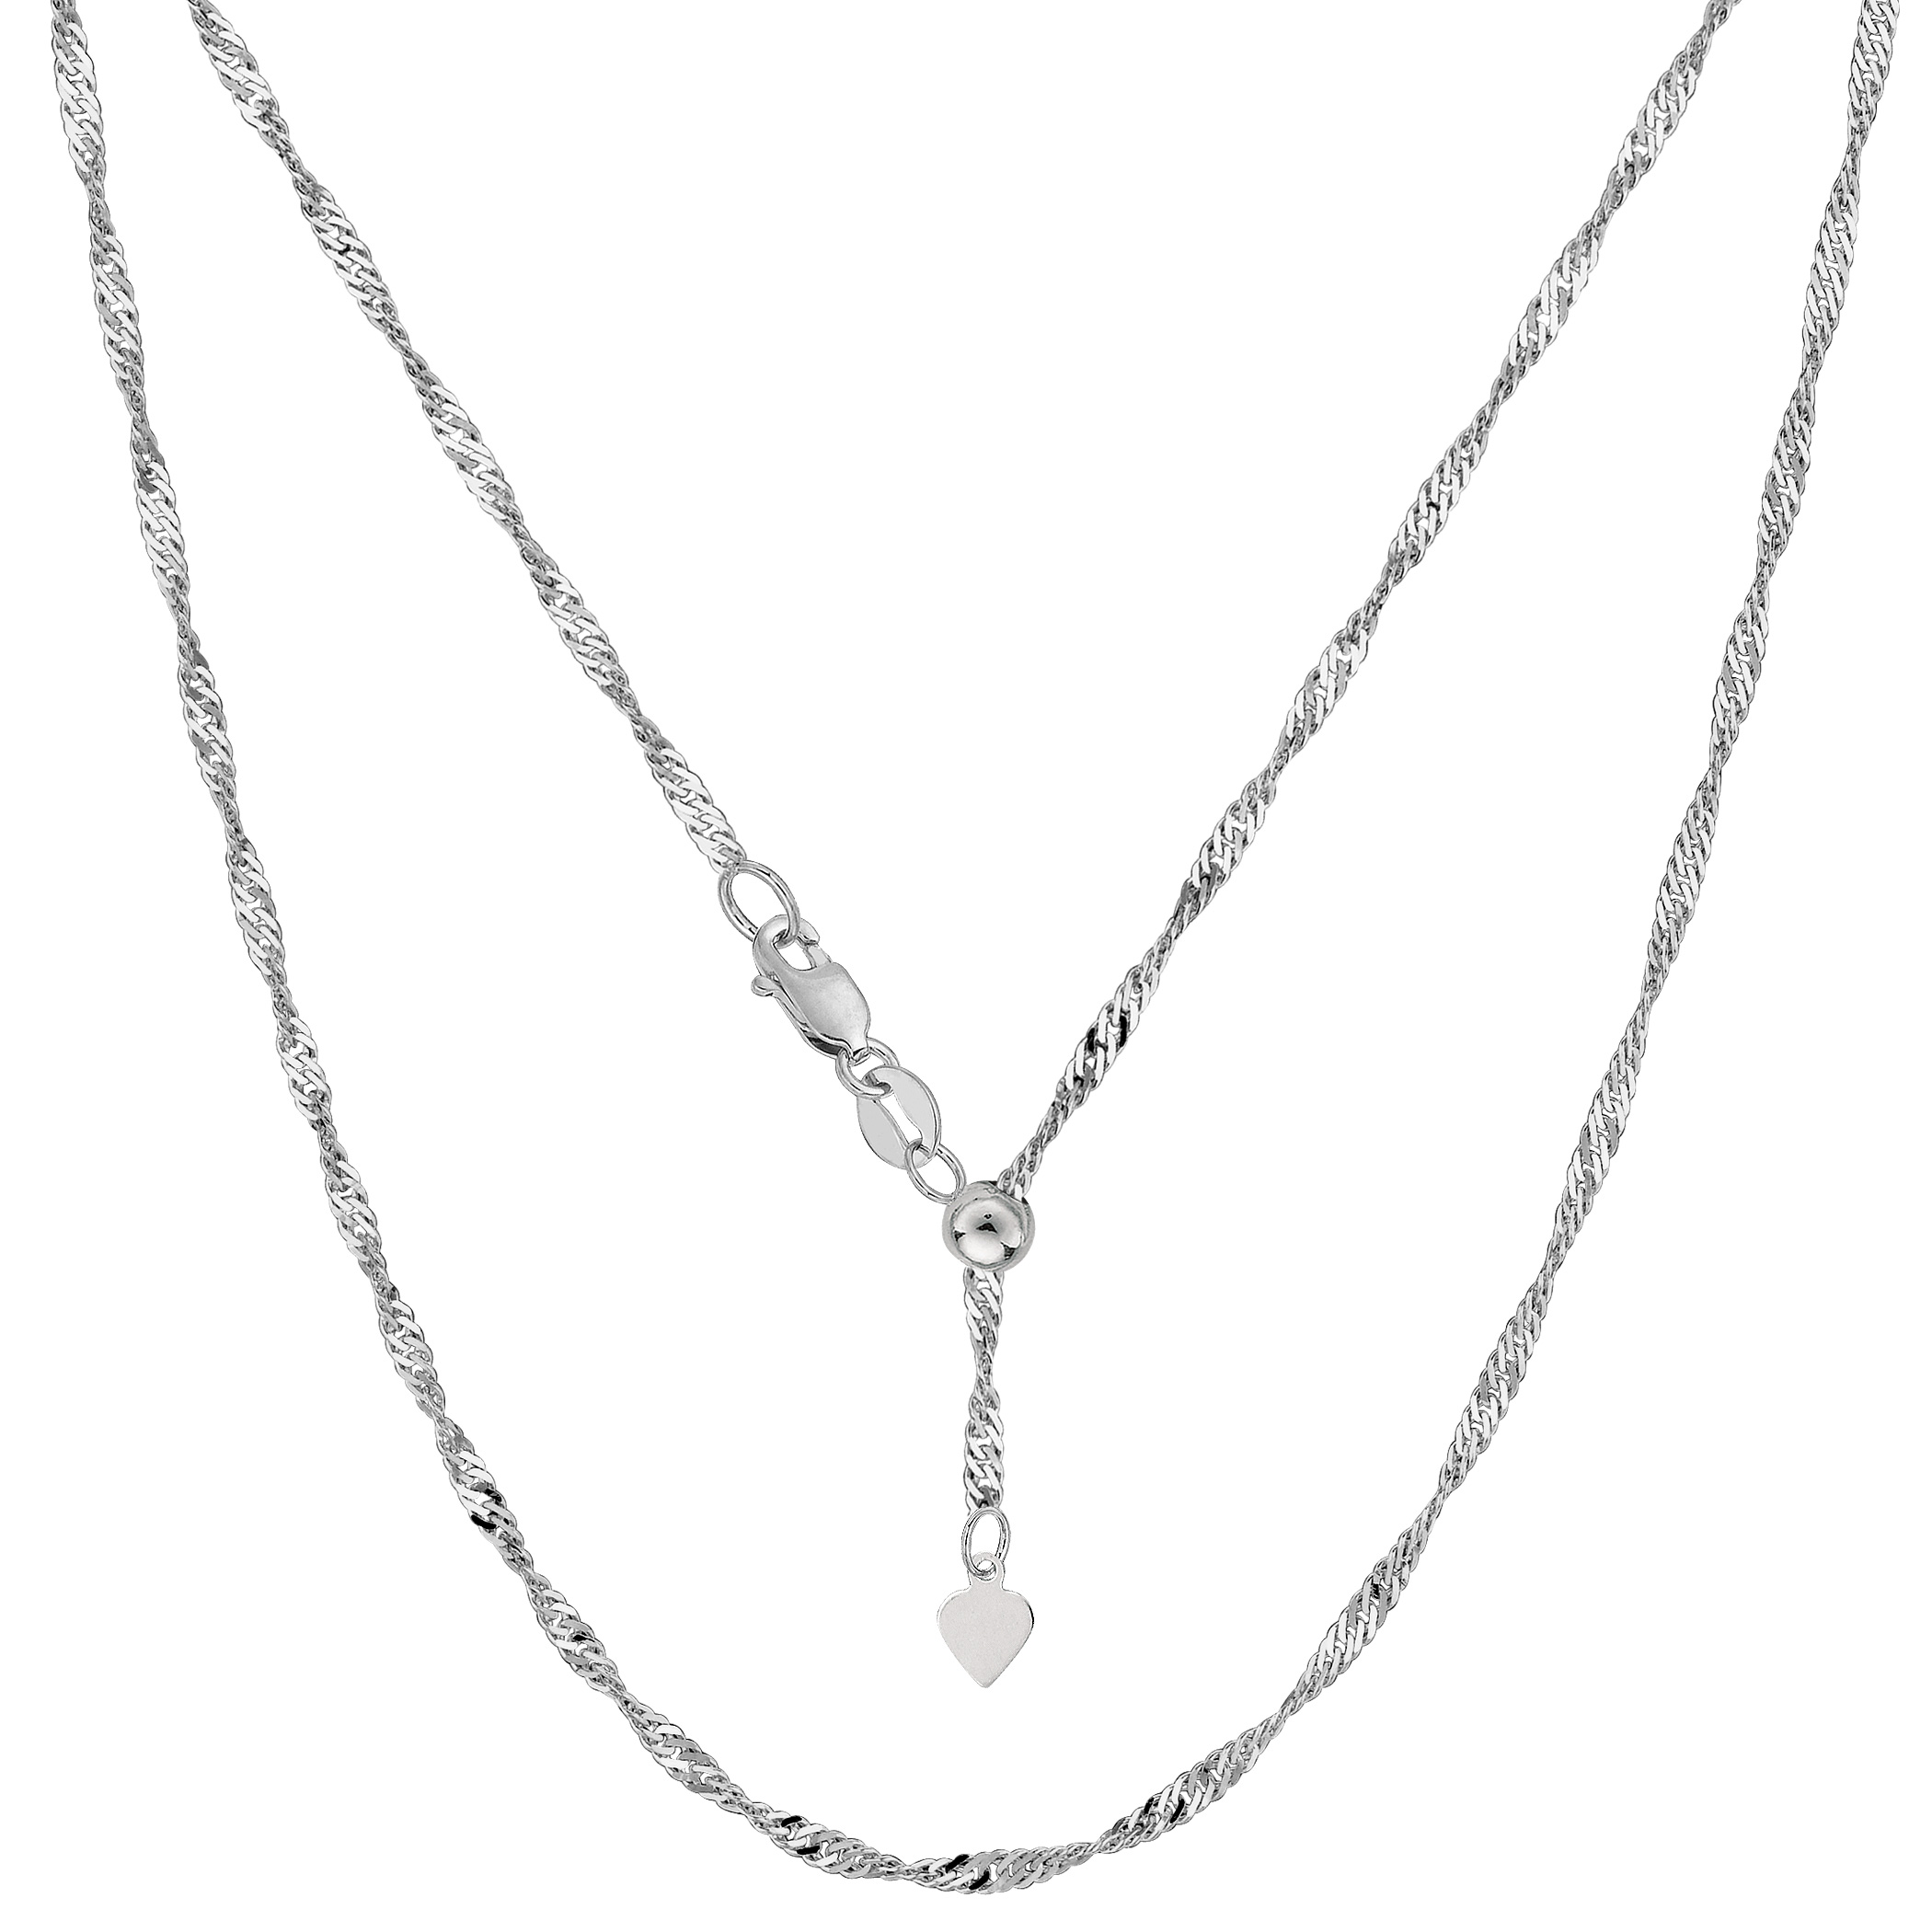 "JewelryAffairs 14k White Gold Adjustable Singapore Link Chain Necklace, 1.15mm, 22"" by JewelryAffairs"